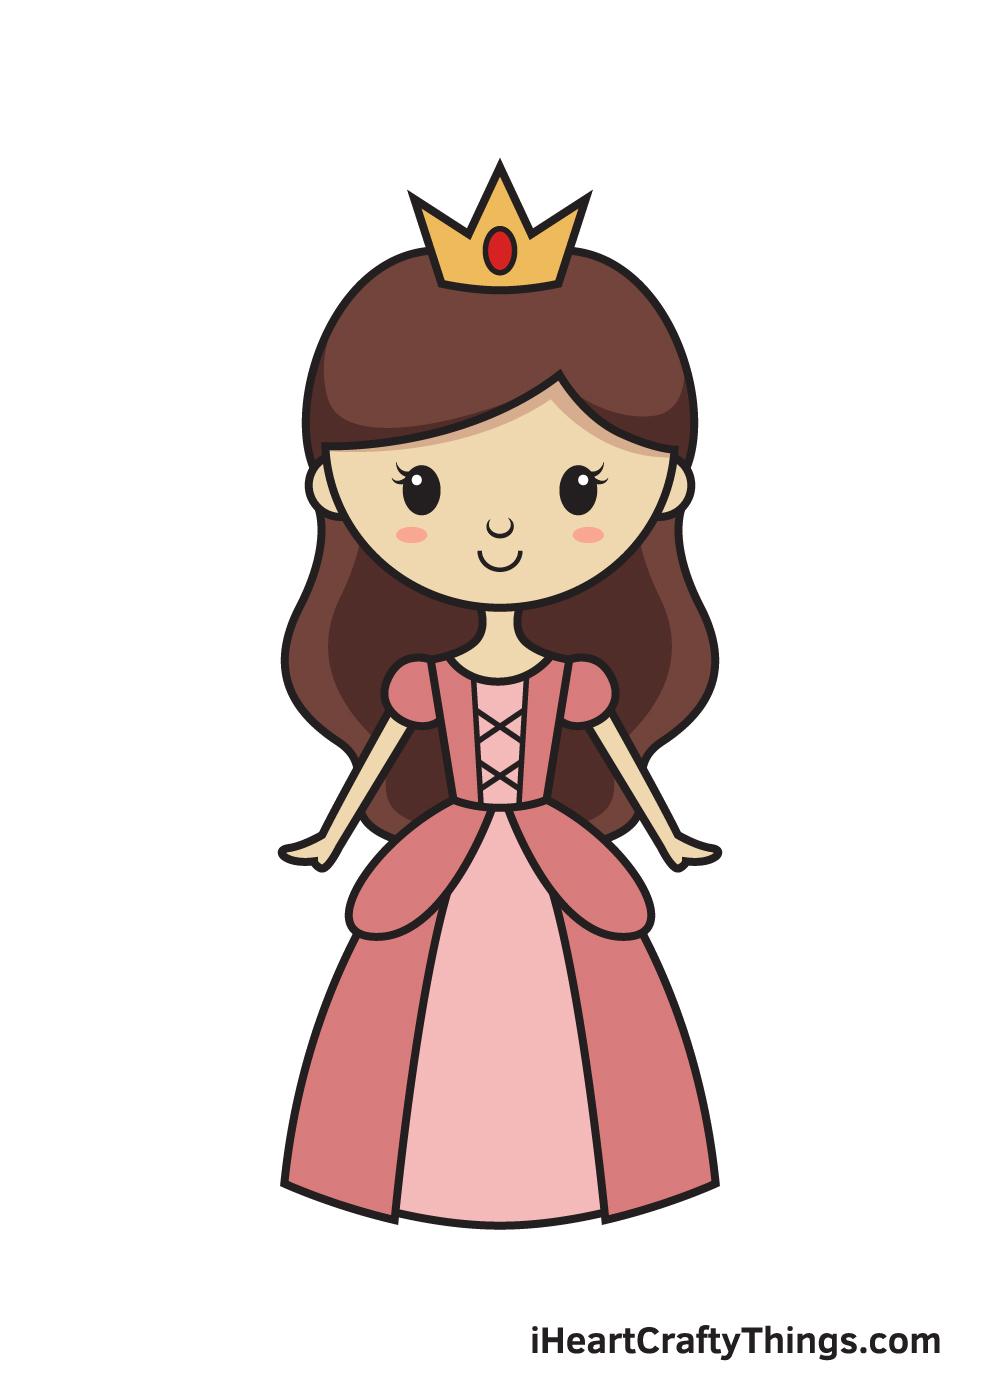 Princess Drawing – 9 Steps